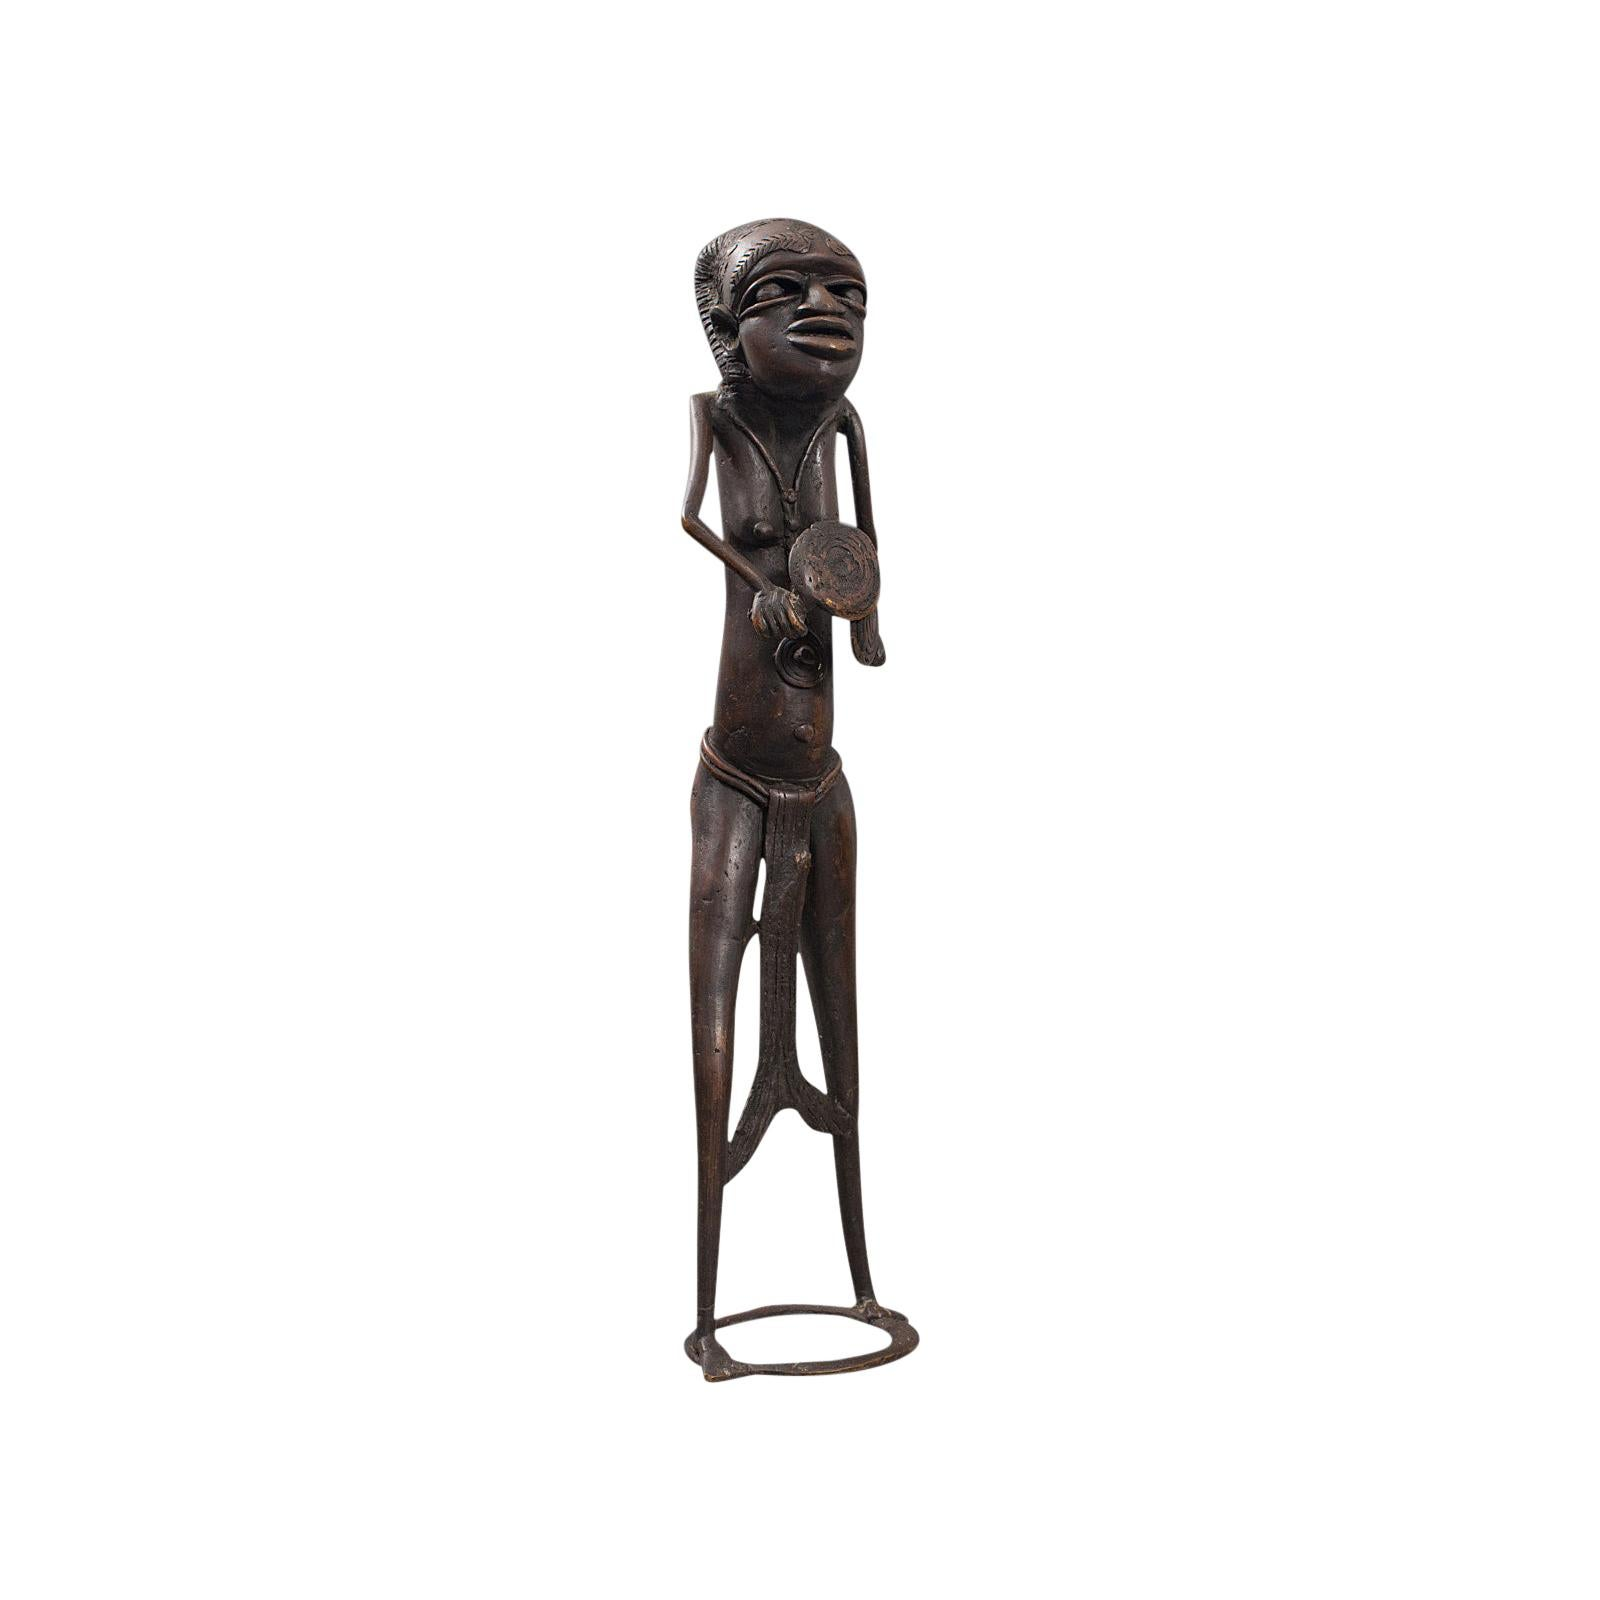 Tall Antique Tribal Figure, West African, Benin Kingdom, Female Statue